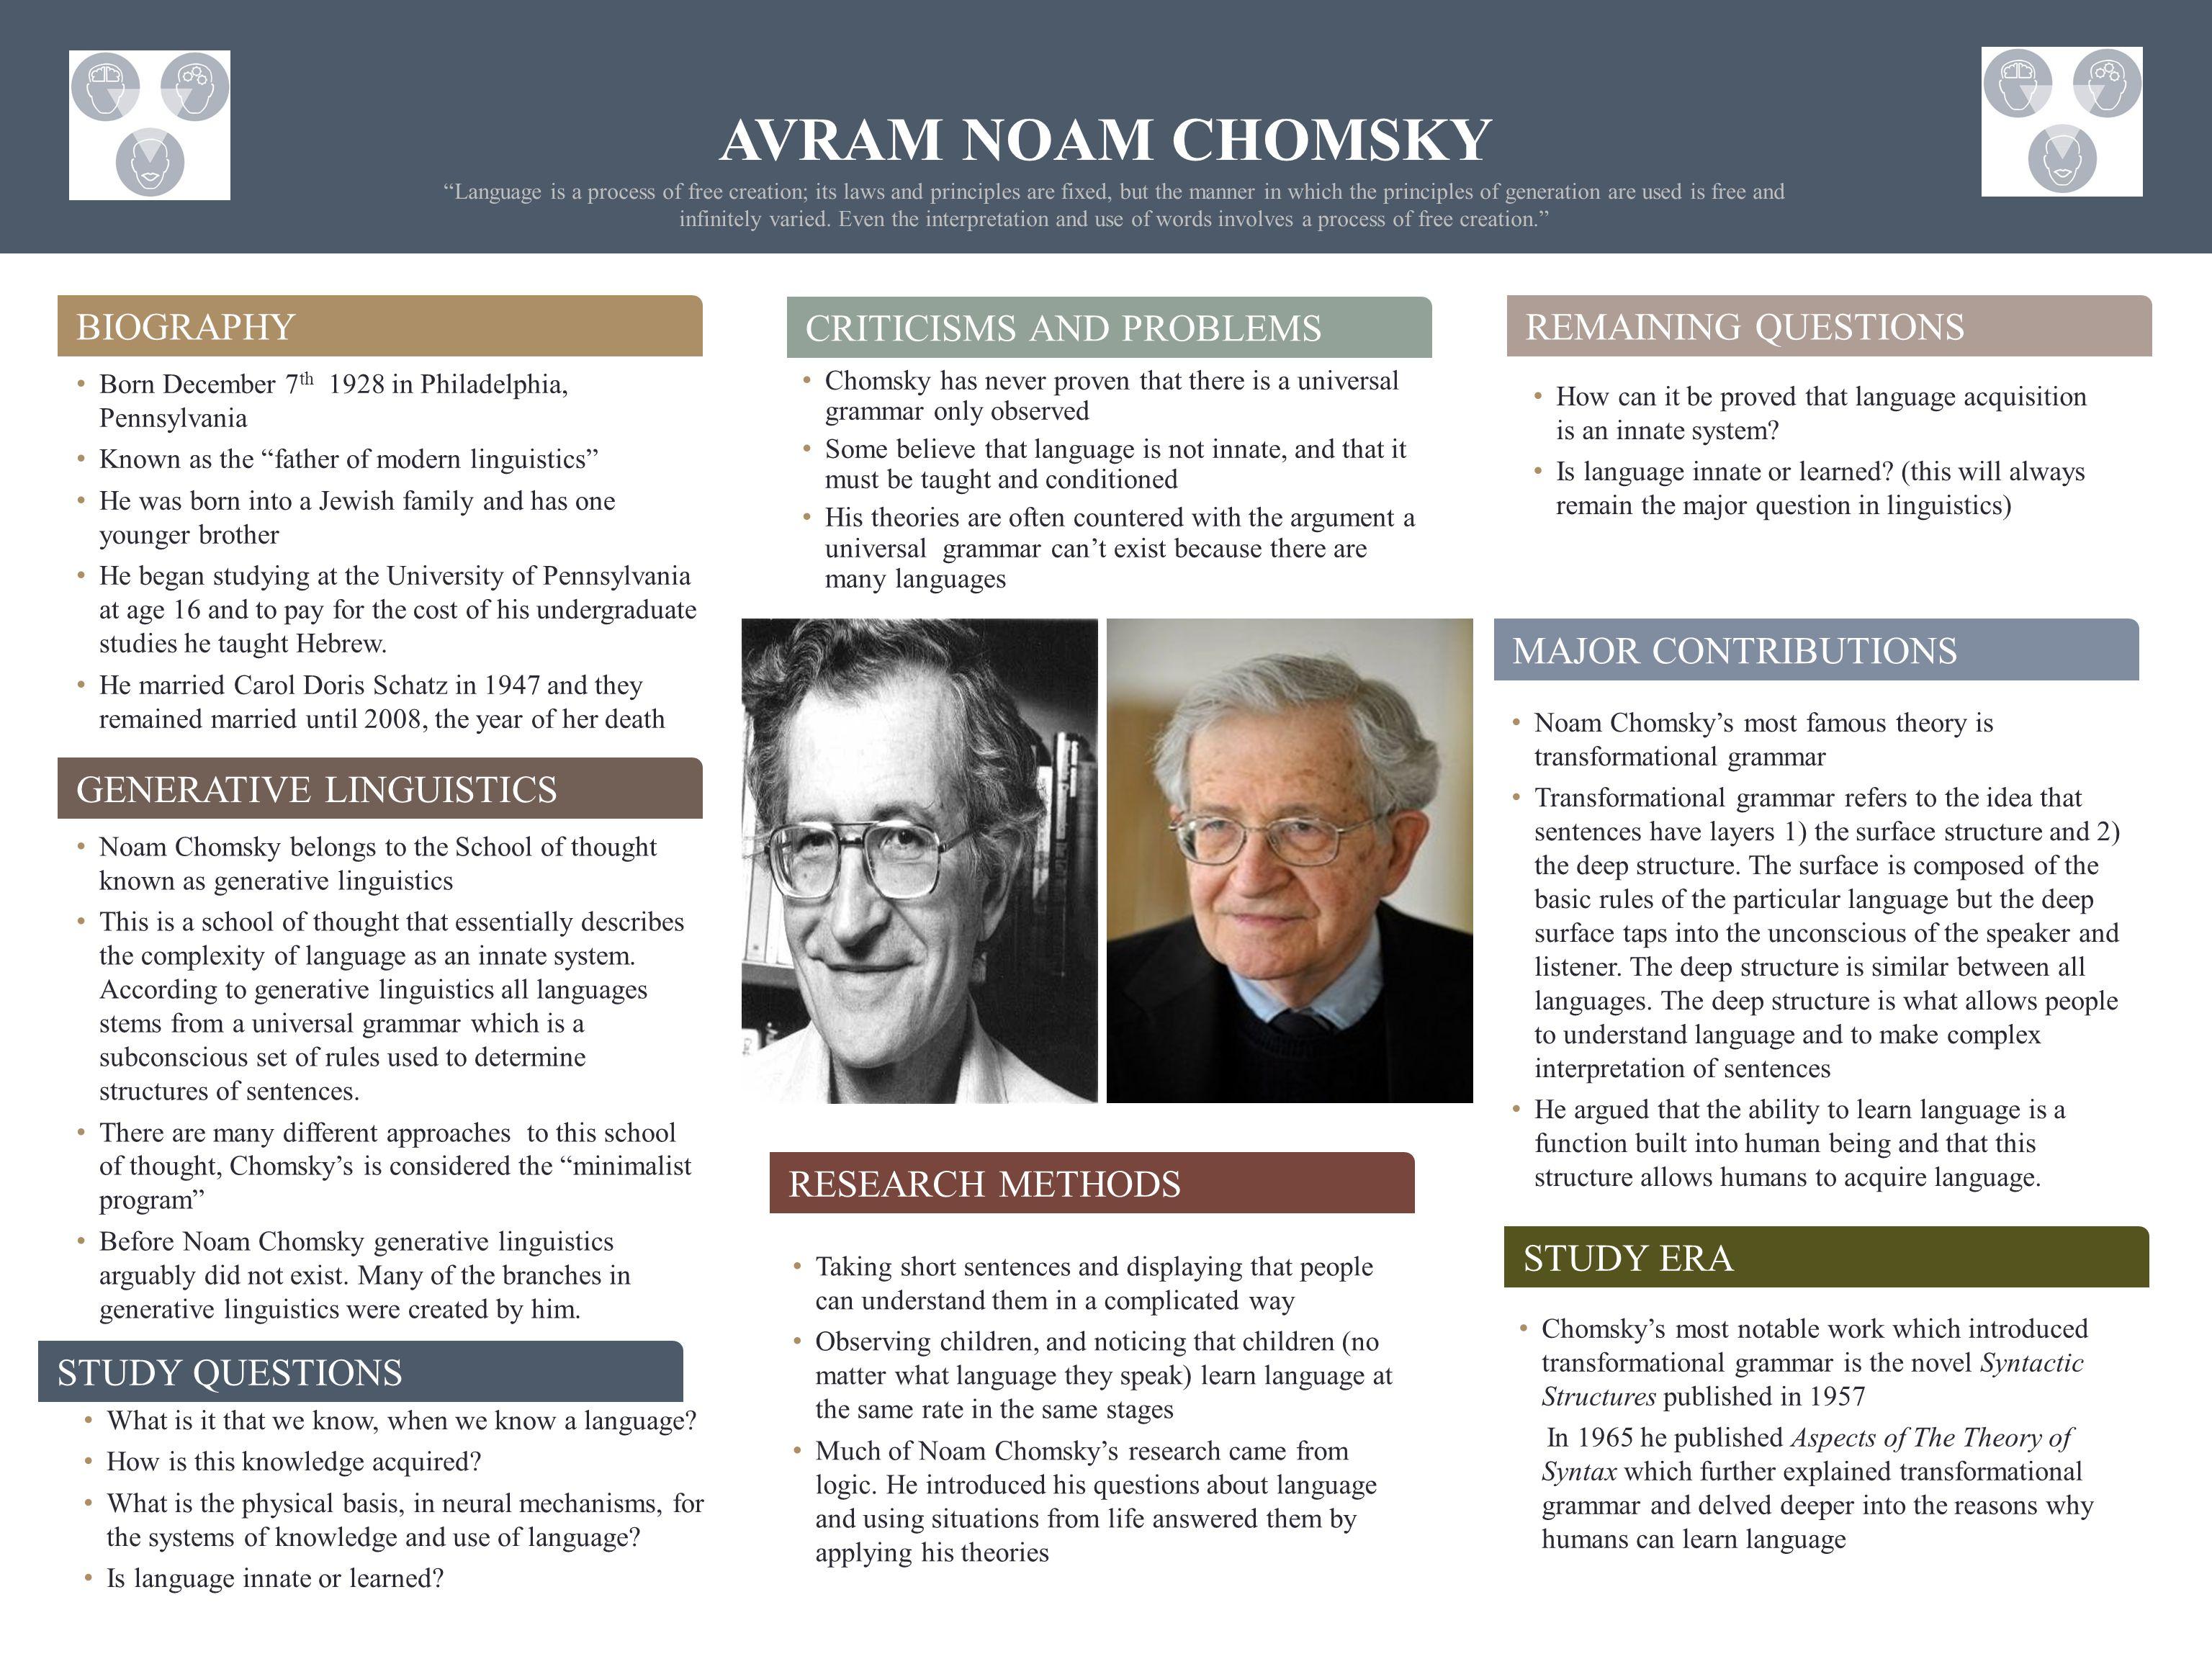 AVRAM NOAM CHOMSKY BIOGRAPHY GENERATIVE LINGUISTICS Noam Chomsky belongs to the School of thought known as generative linguistics This is a school of